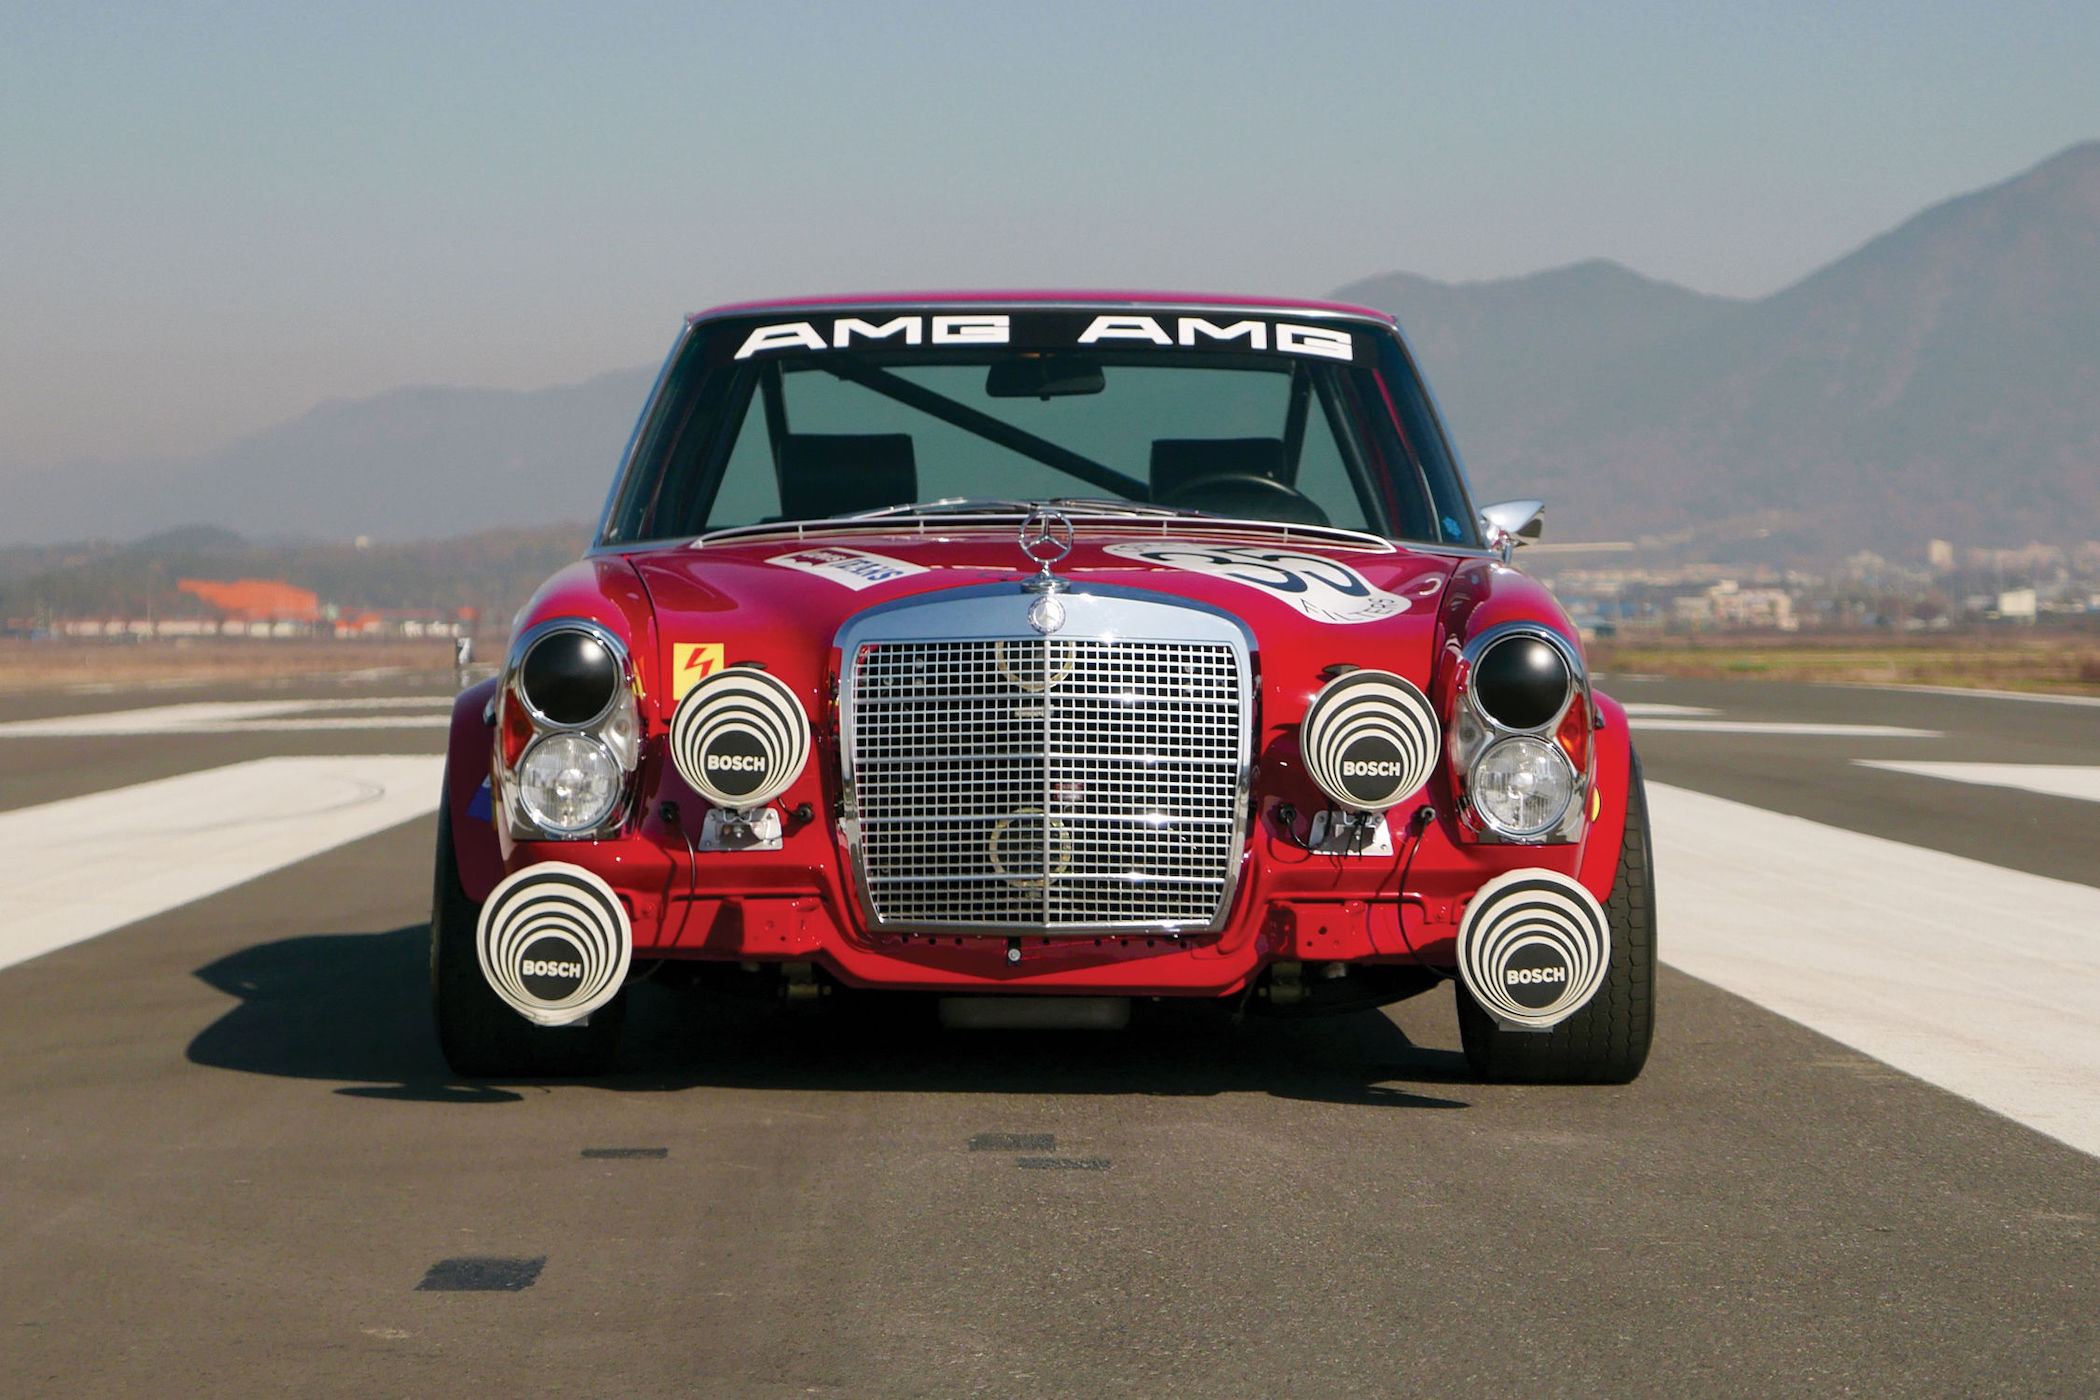 Petrolhead Corner - Mercedes 300 SEL 6.8 AMG red pig - 4